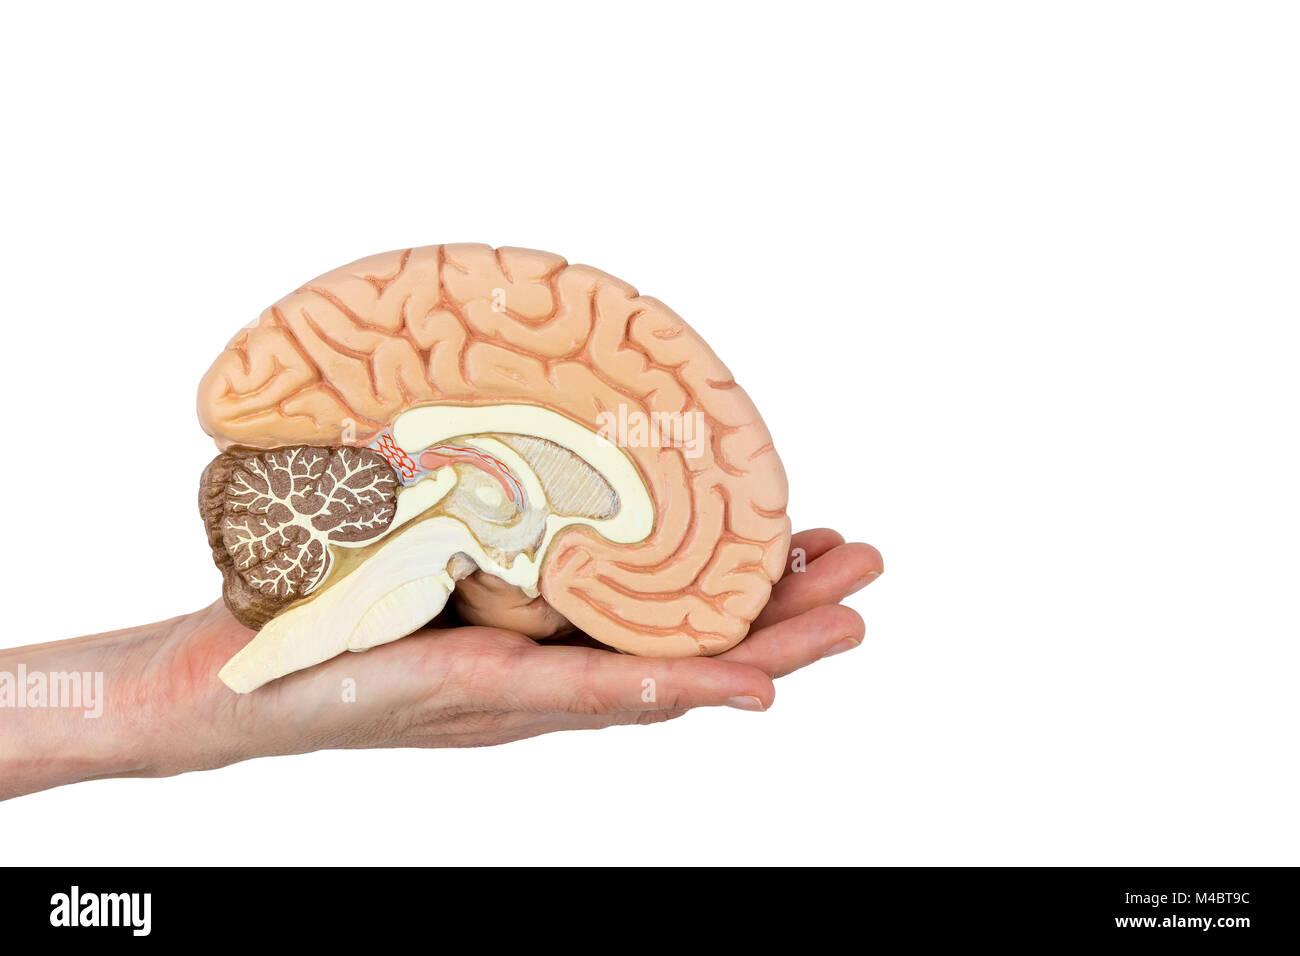 Hand holding brain hemisphere on white background - Stock Image